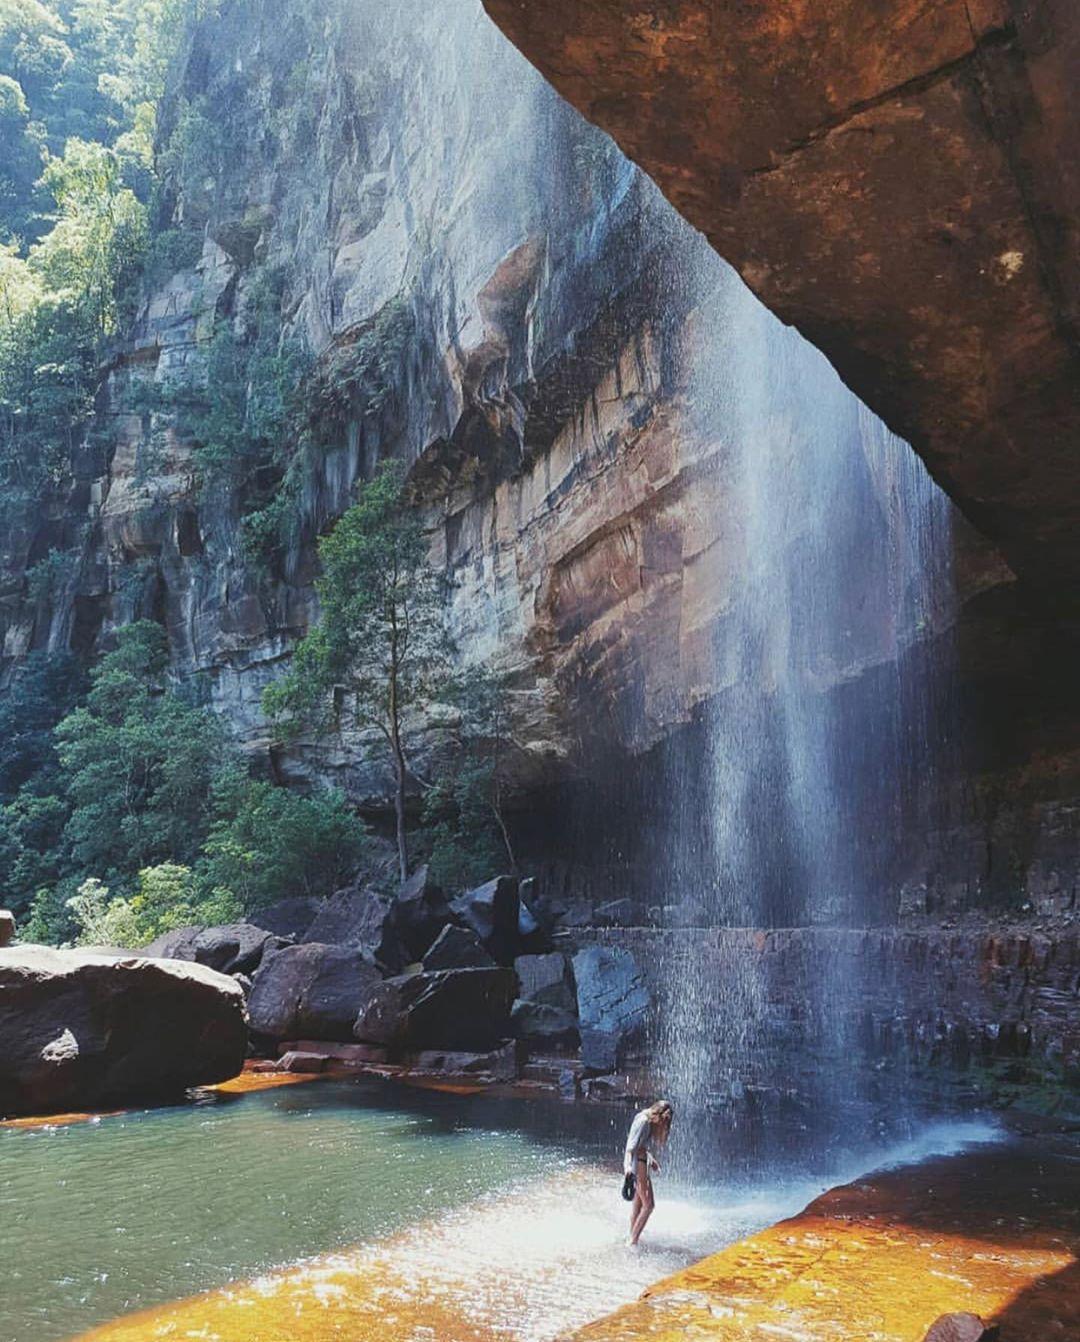 Image by hike_australiavia Instagram.